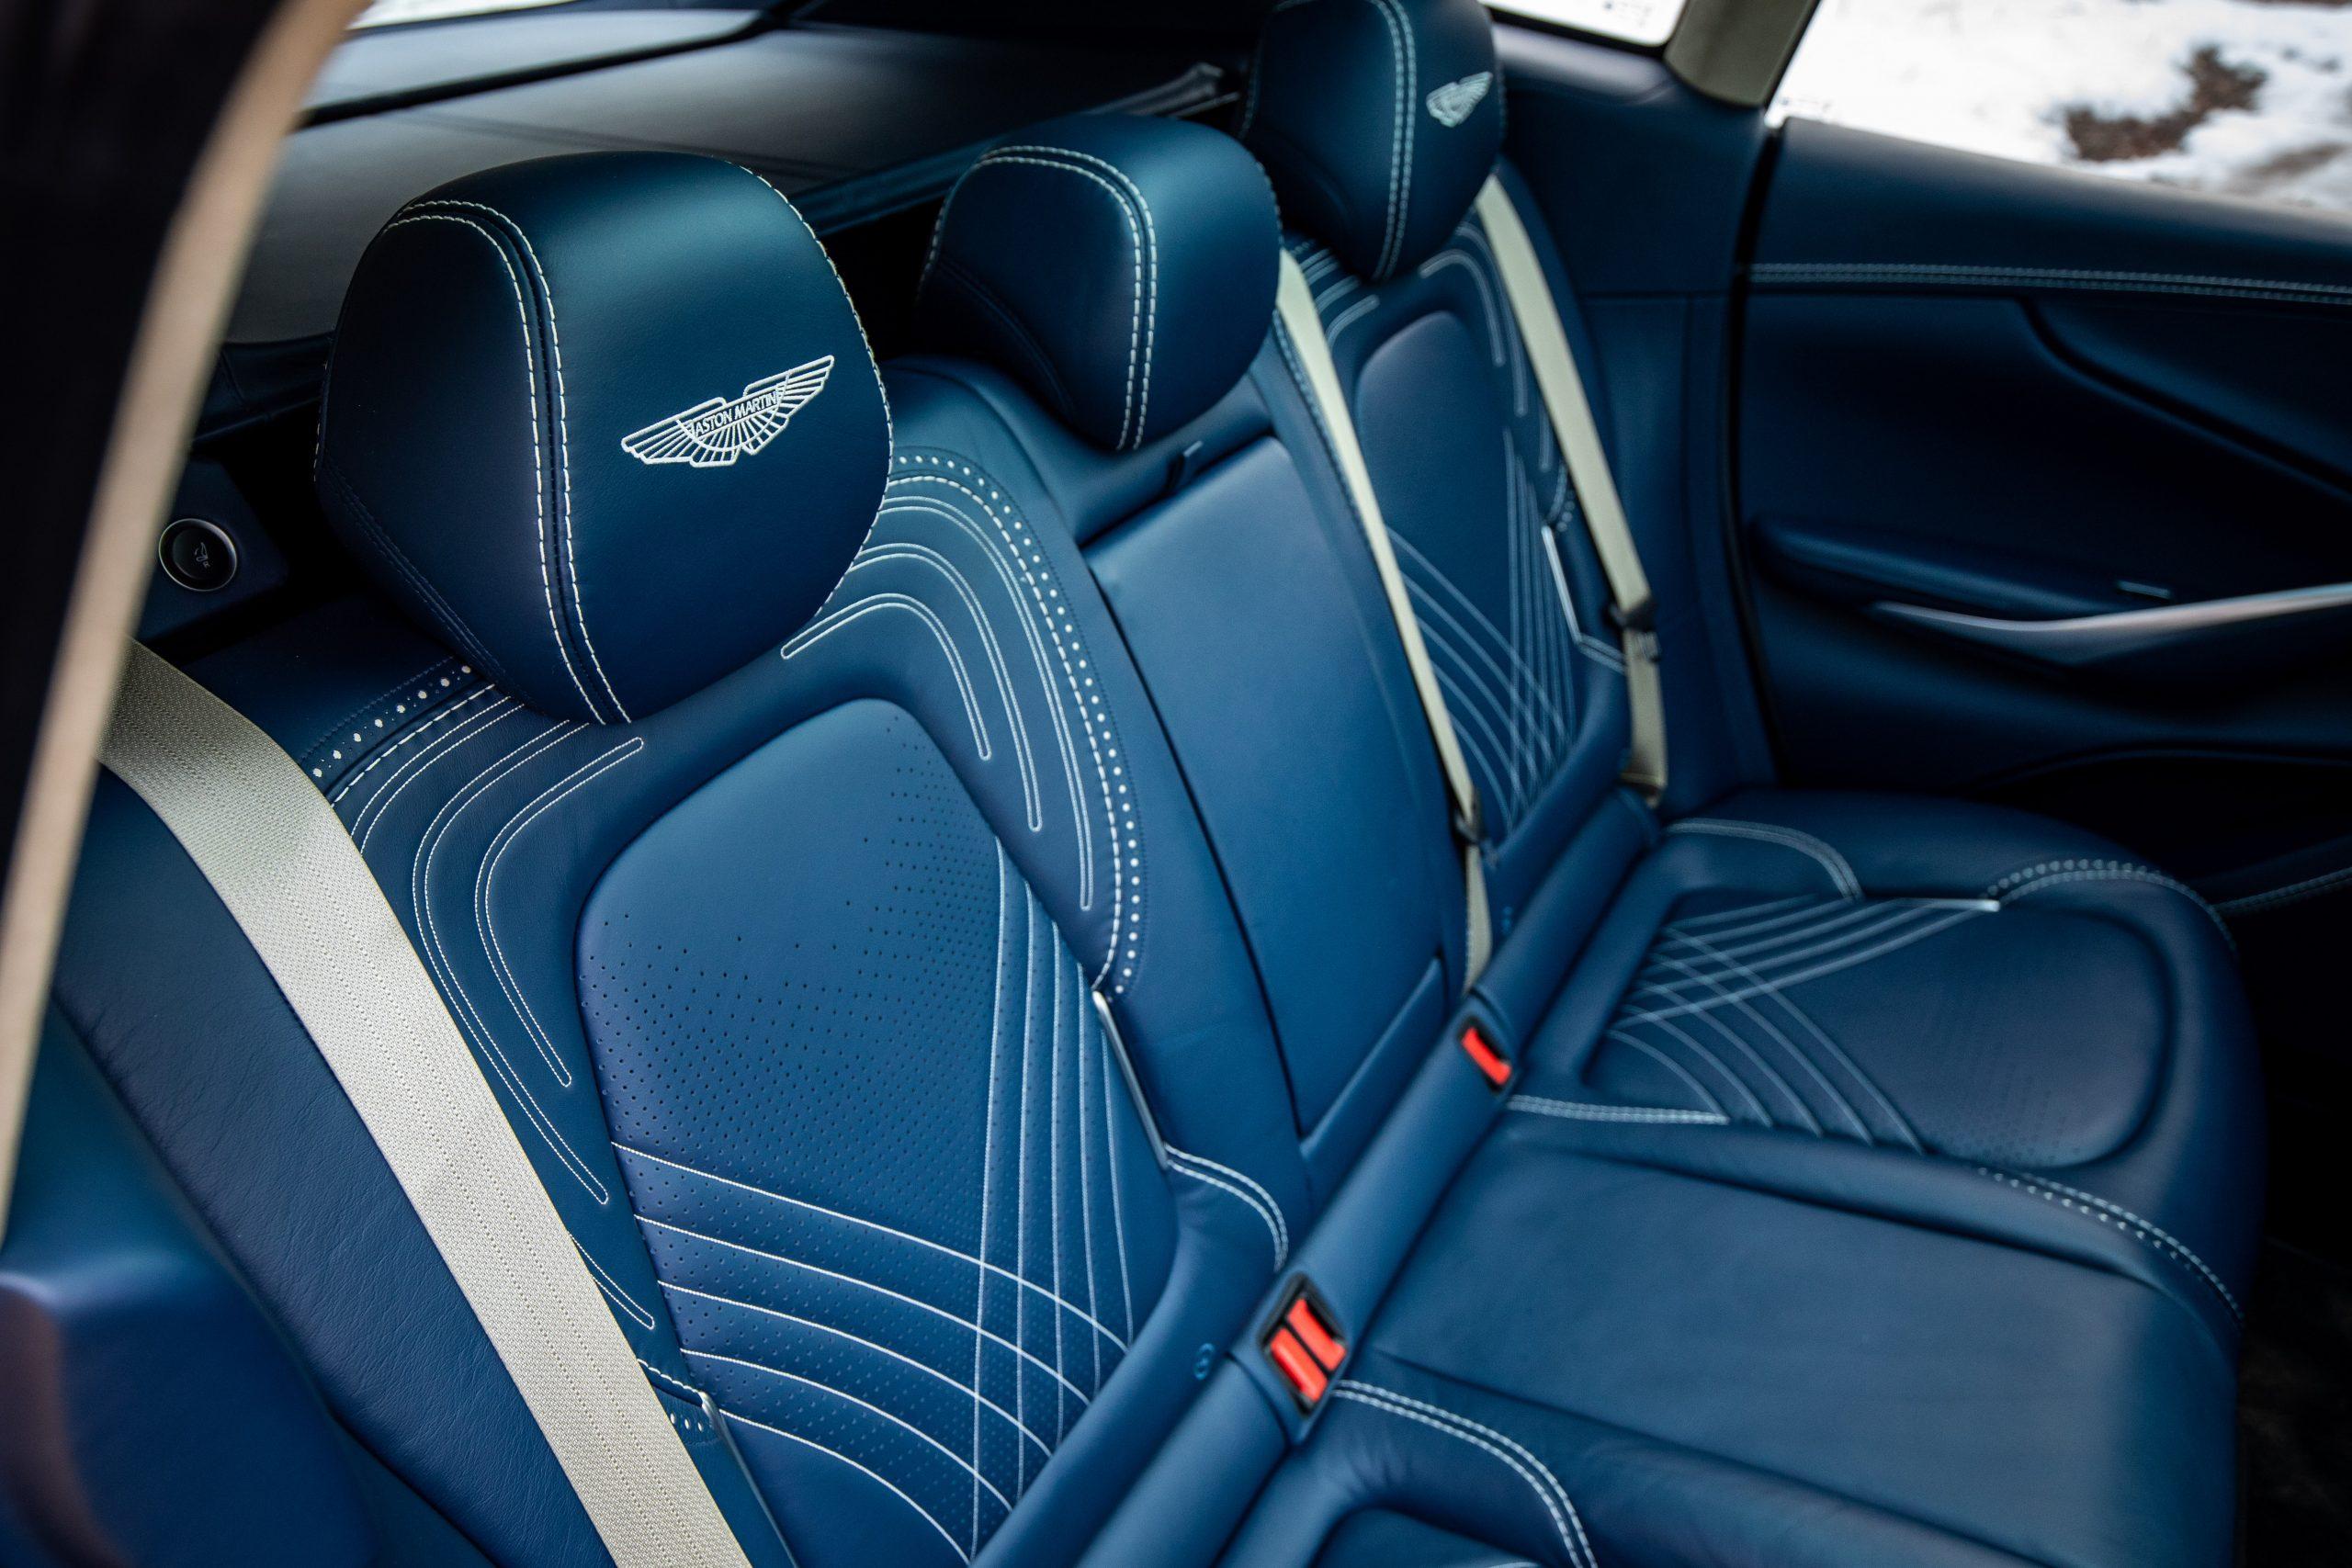 2021 Aston Martin DBX interior rear seat